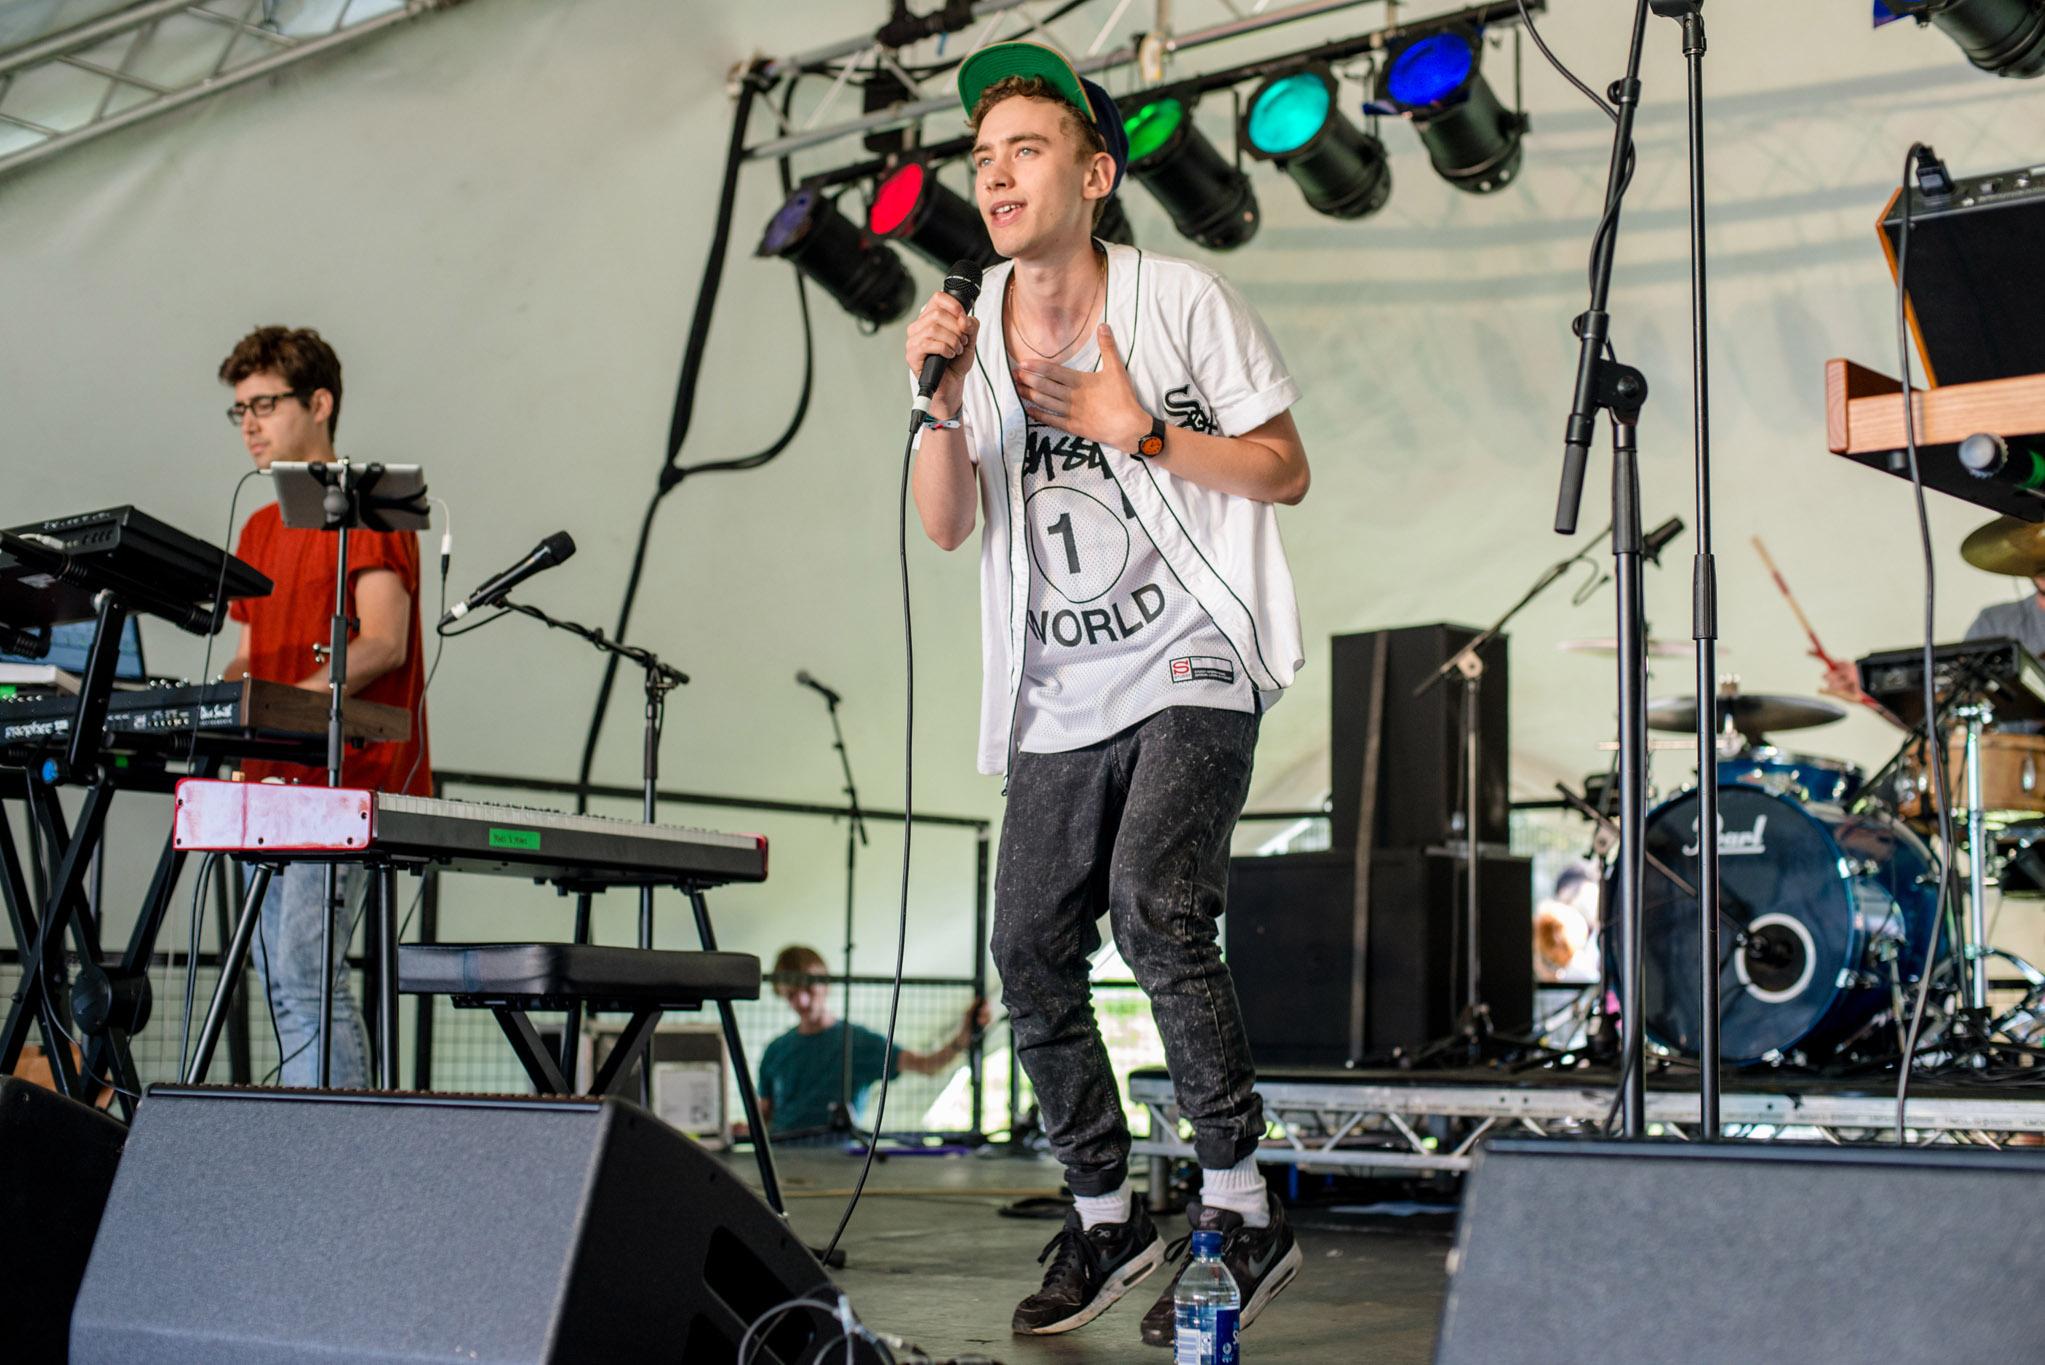 Beacons Festival 2014: Saturday